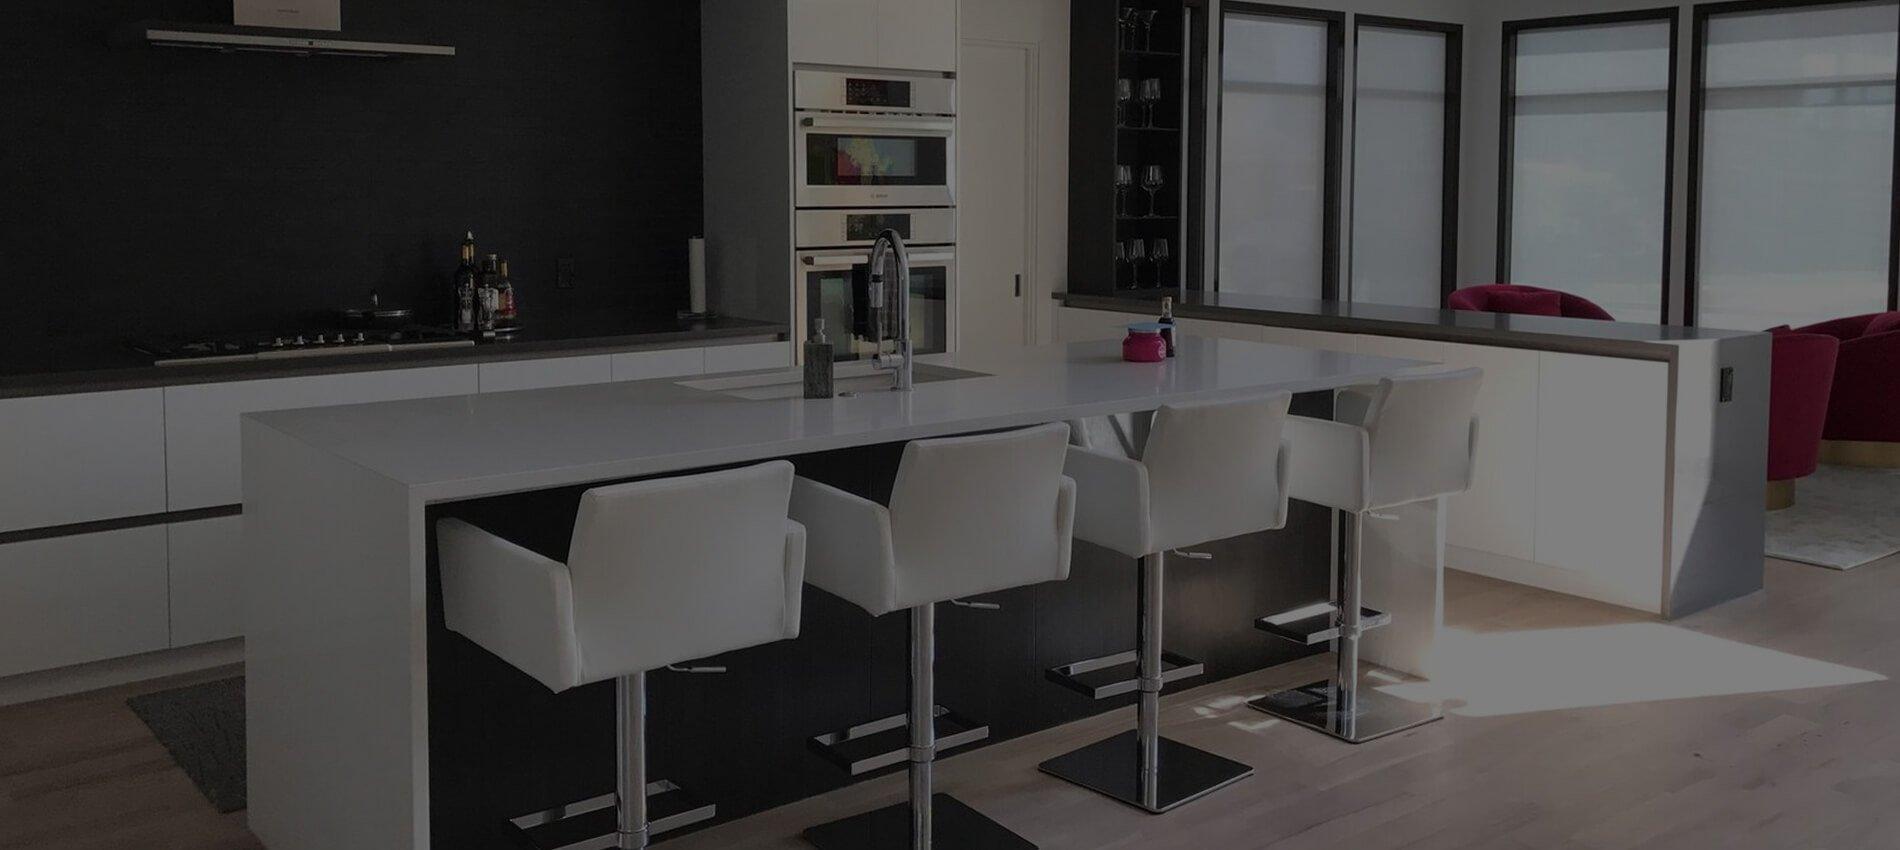 home automation services for oklahoma city edmond yukon vox rh voxaudiovisual com